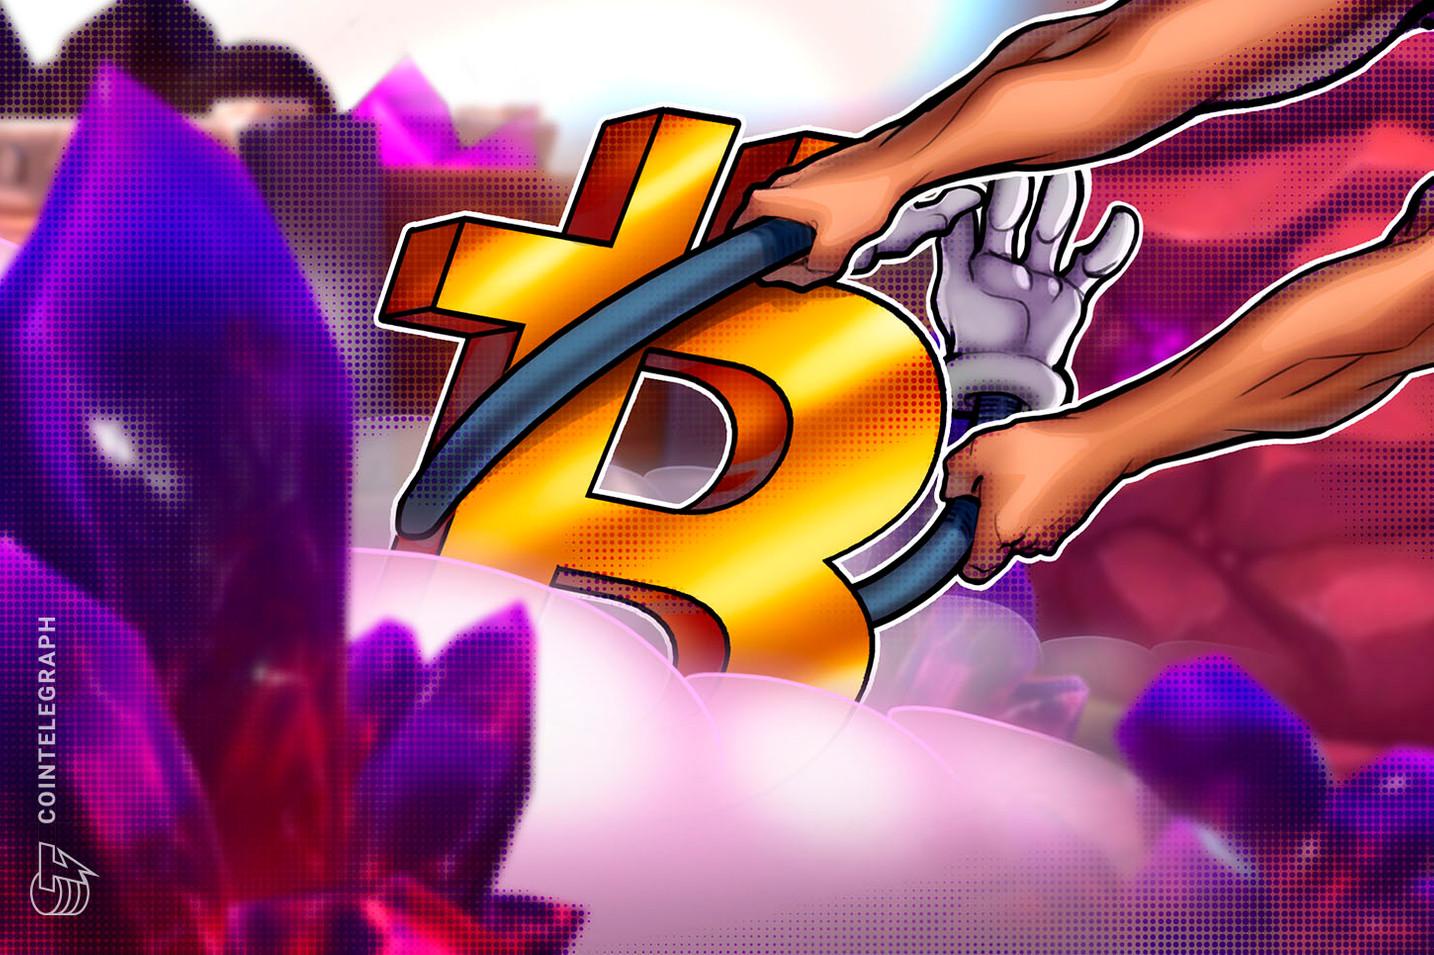 Bitcoin bricht aus Bullenwimpel aus: Prognosen erneut bei 100.000 US-Dollar